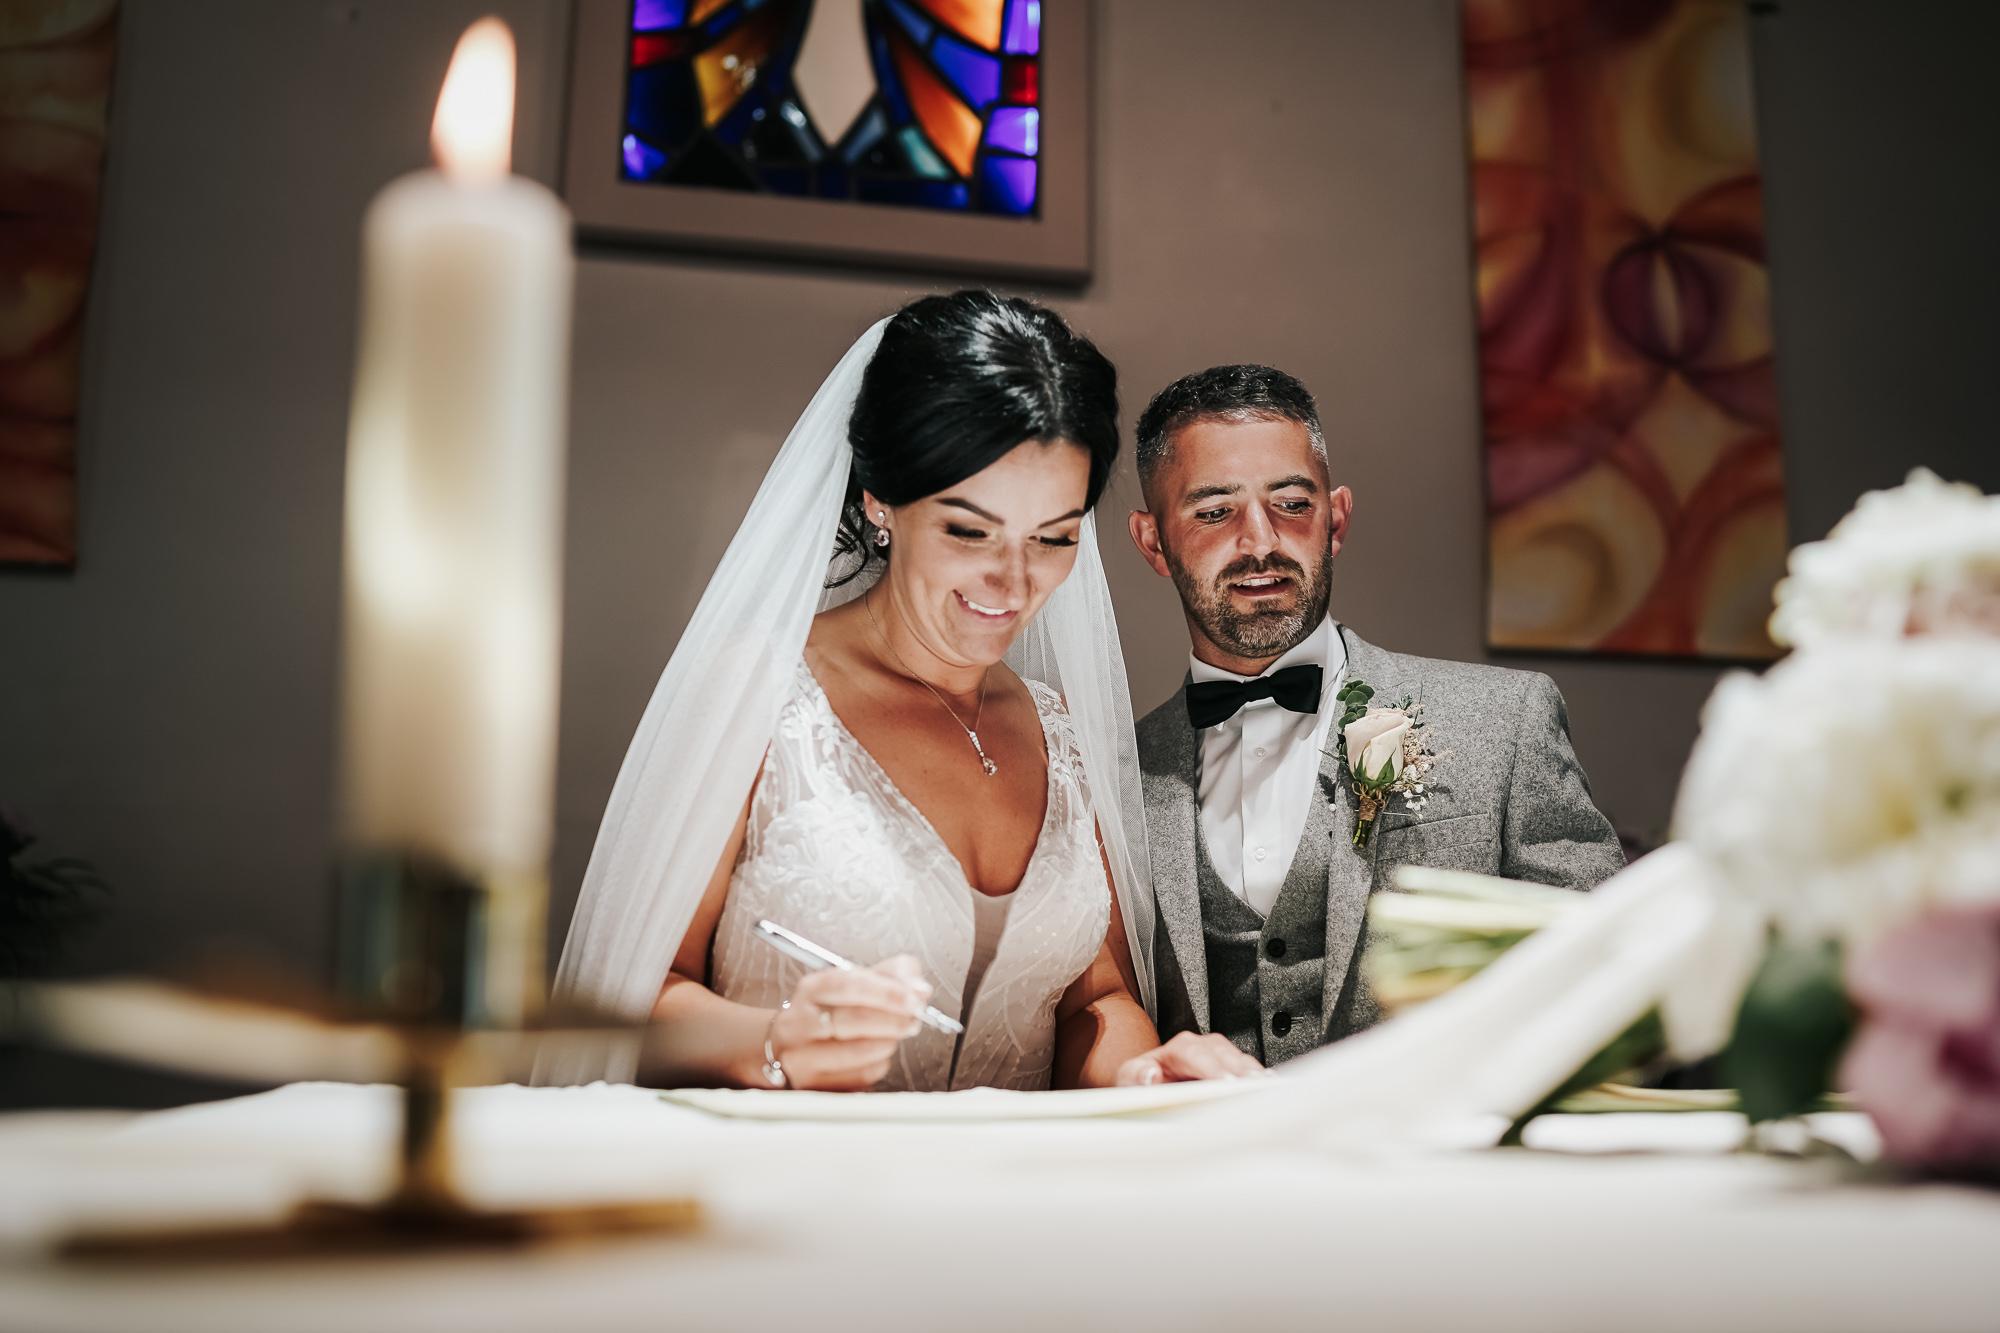 The Hayloft Wedding Photography Cheshire wedding photographer (24 of 52).jpg